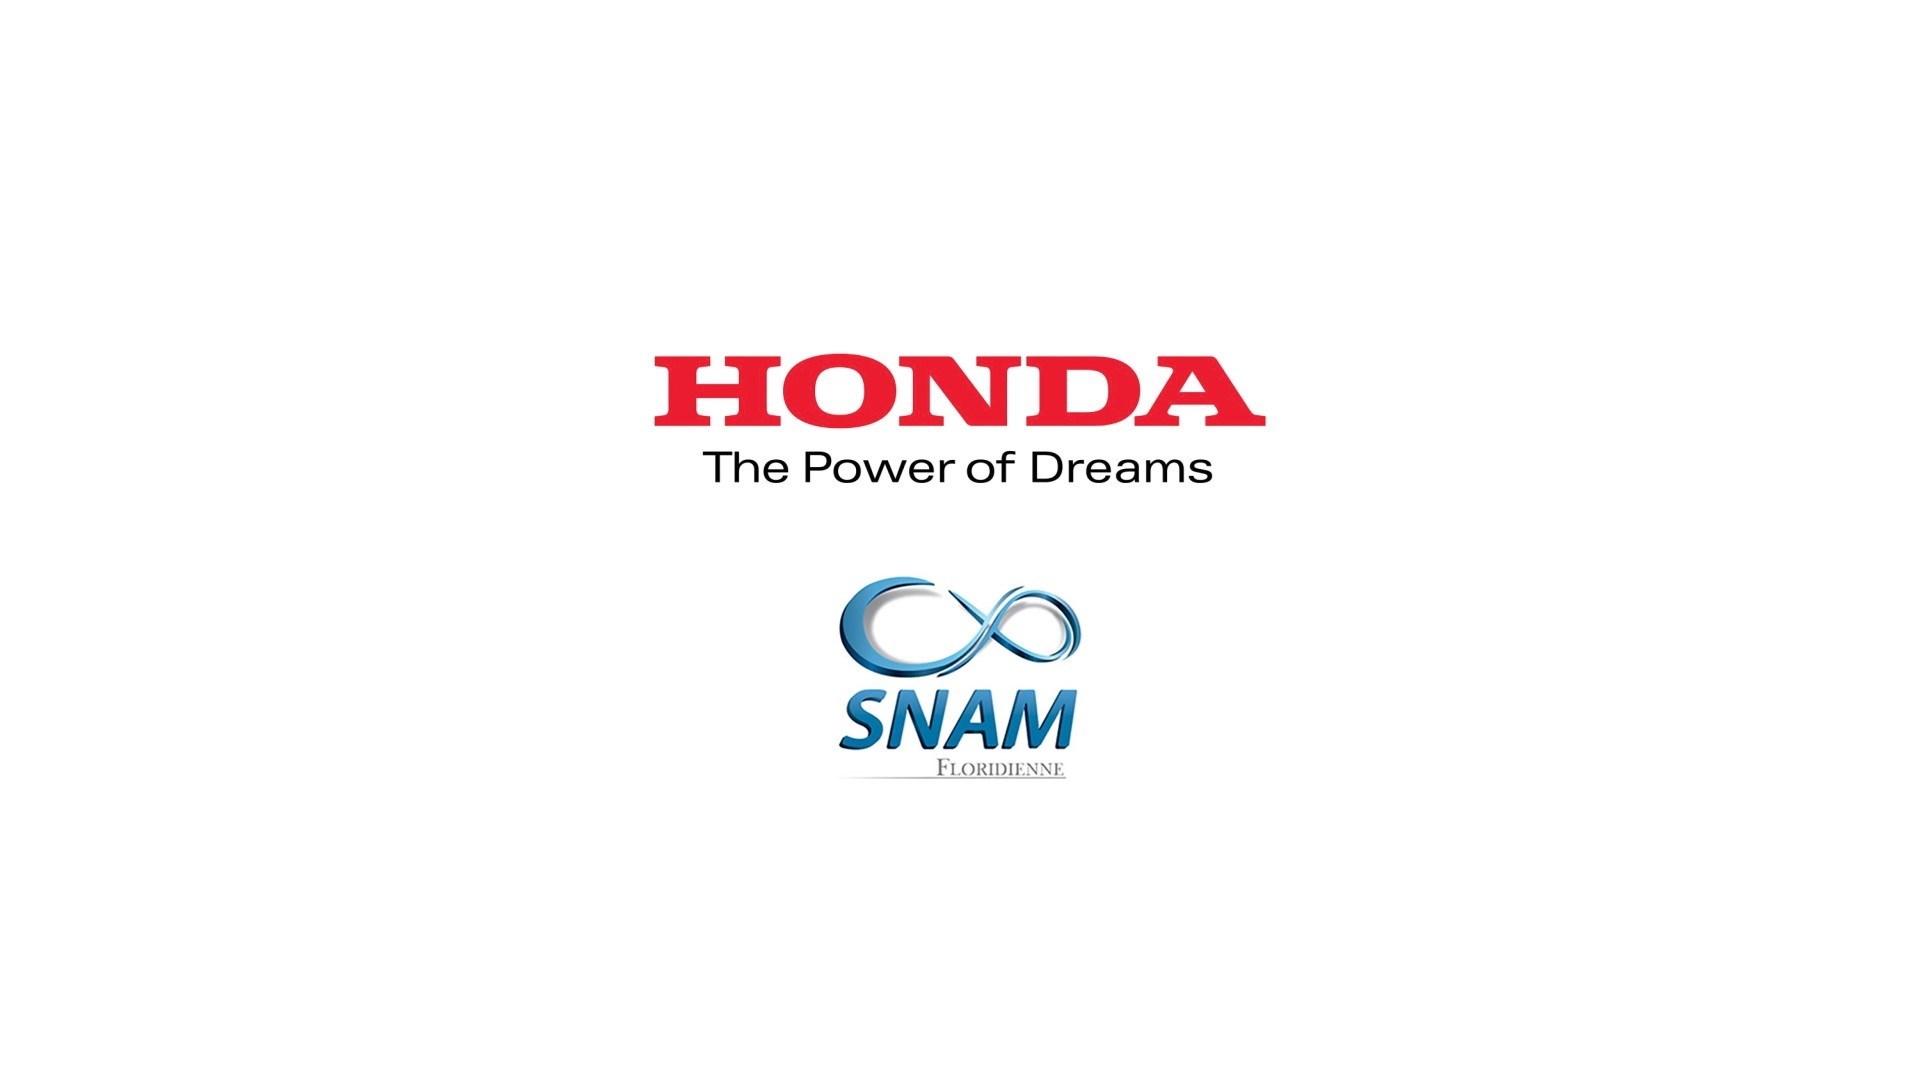 203380 Honda Hybrid EV Batteries Recycling